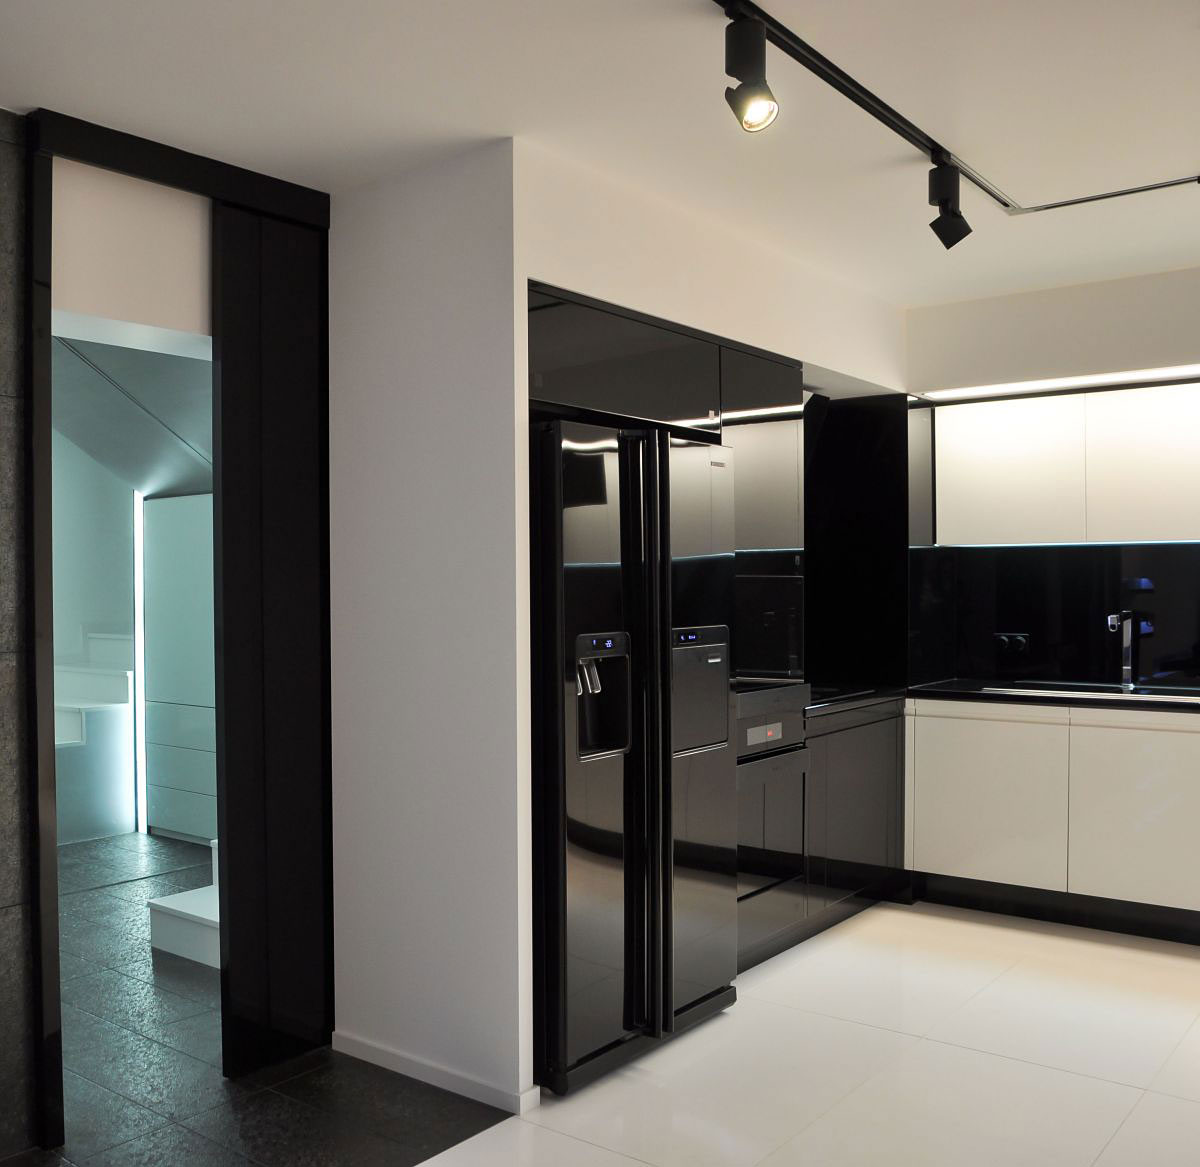 Ultra Modern Apartment Interior by Jovo Bozhinovski (10)